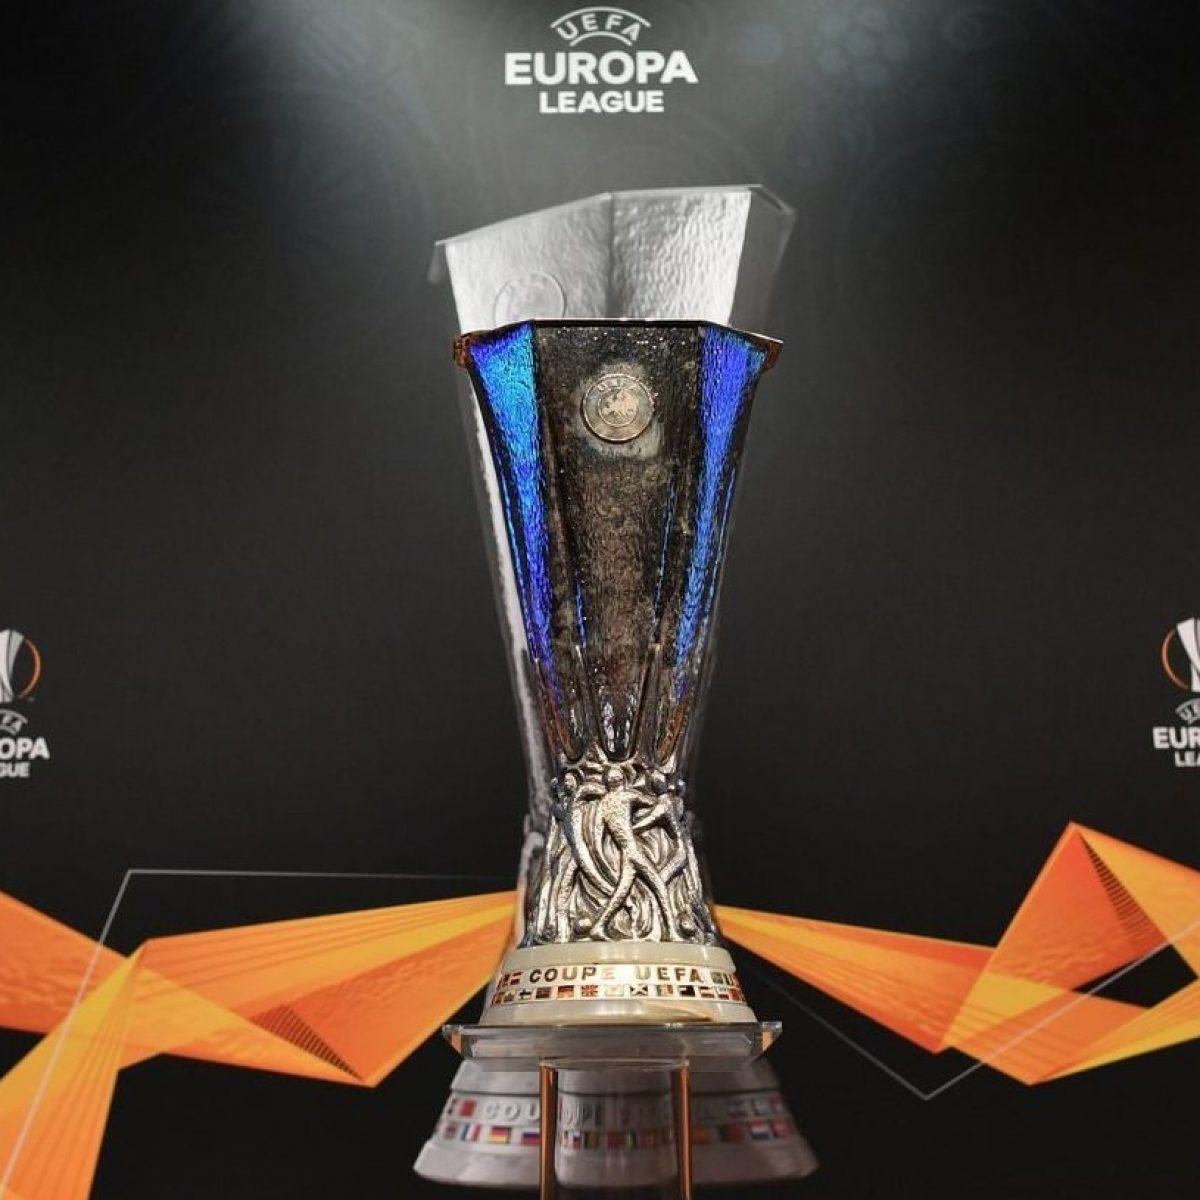 Roma Calendario Europa League.Europa League 2019 2020 Tutte Le Squadre In Tabellone